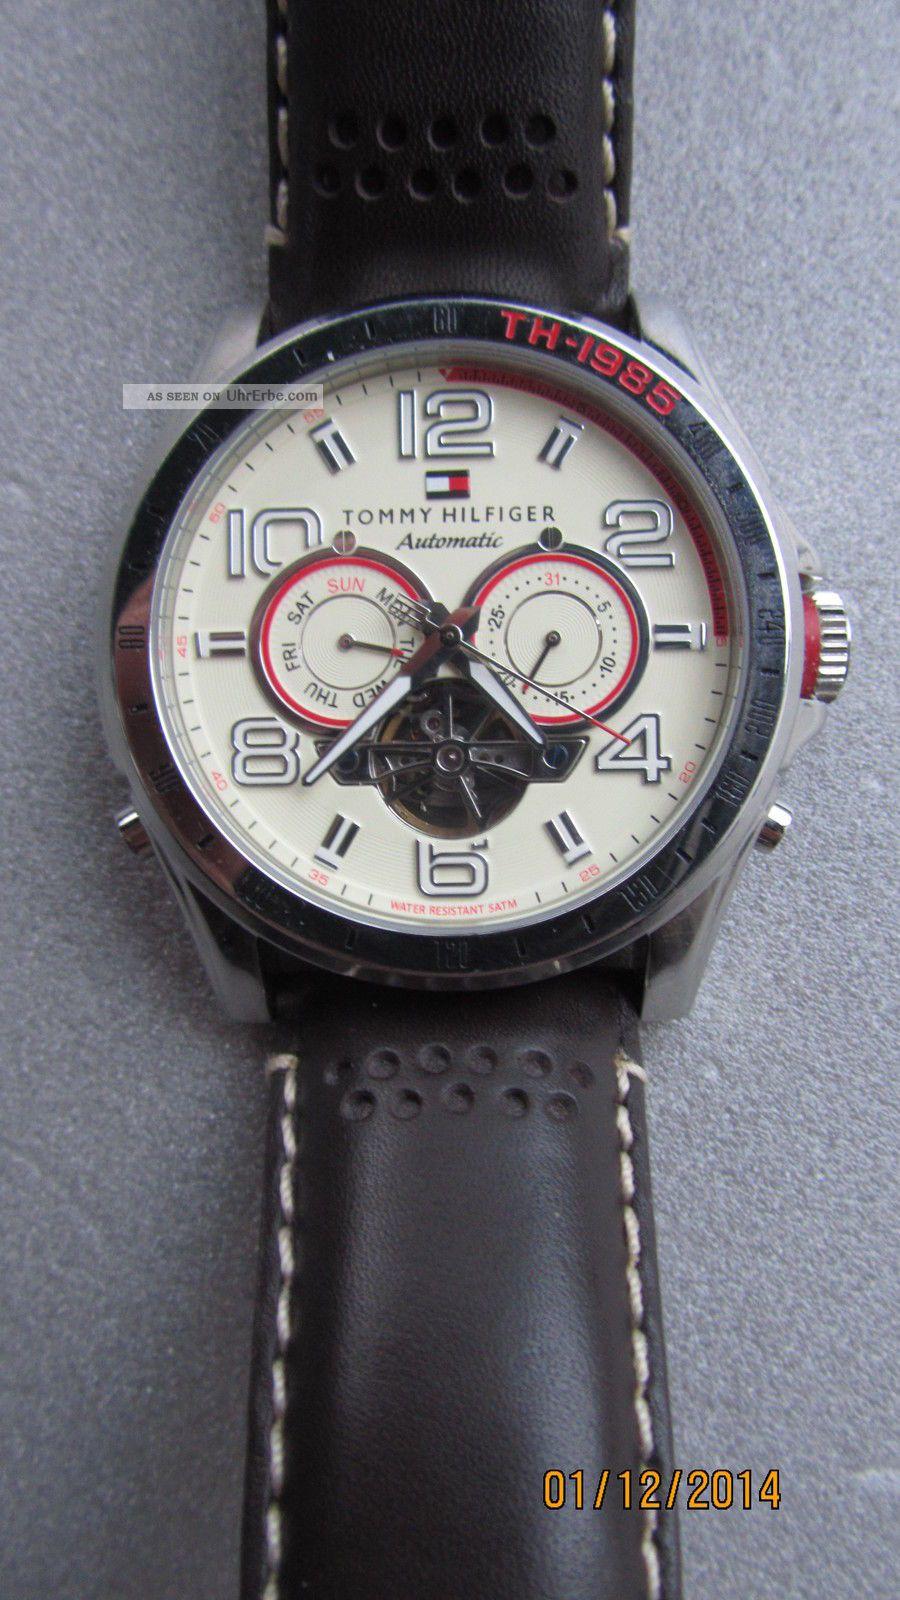 Tommy Hilfiger Th.  98.  1.  14.  0858 Automatic Herrenuhr Armbanduhren Bild